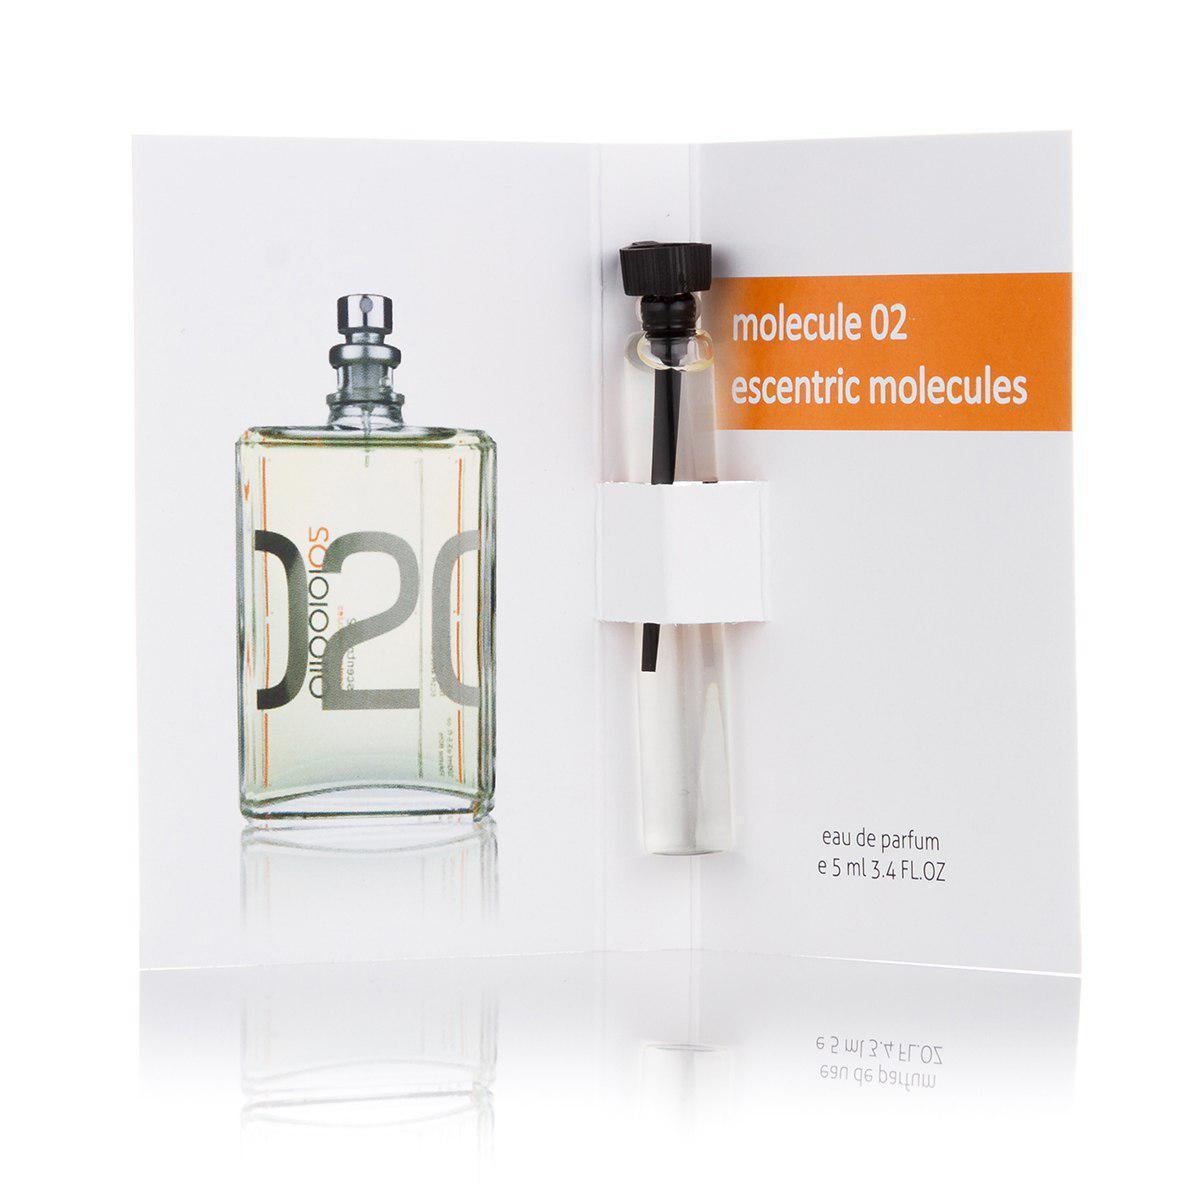 Escentric 02 Escentric Molecules (молекула 02) мини парфюм пробник 5 ml  ОАЭ (реплика)